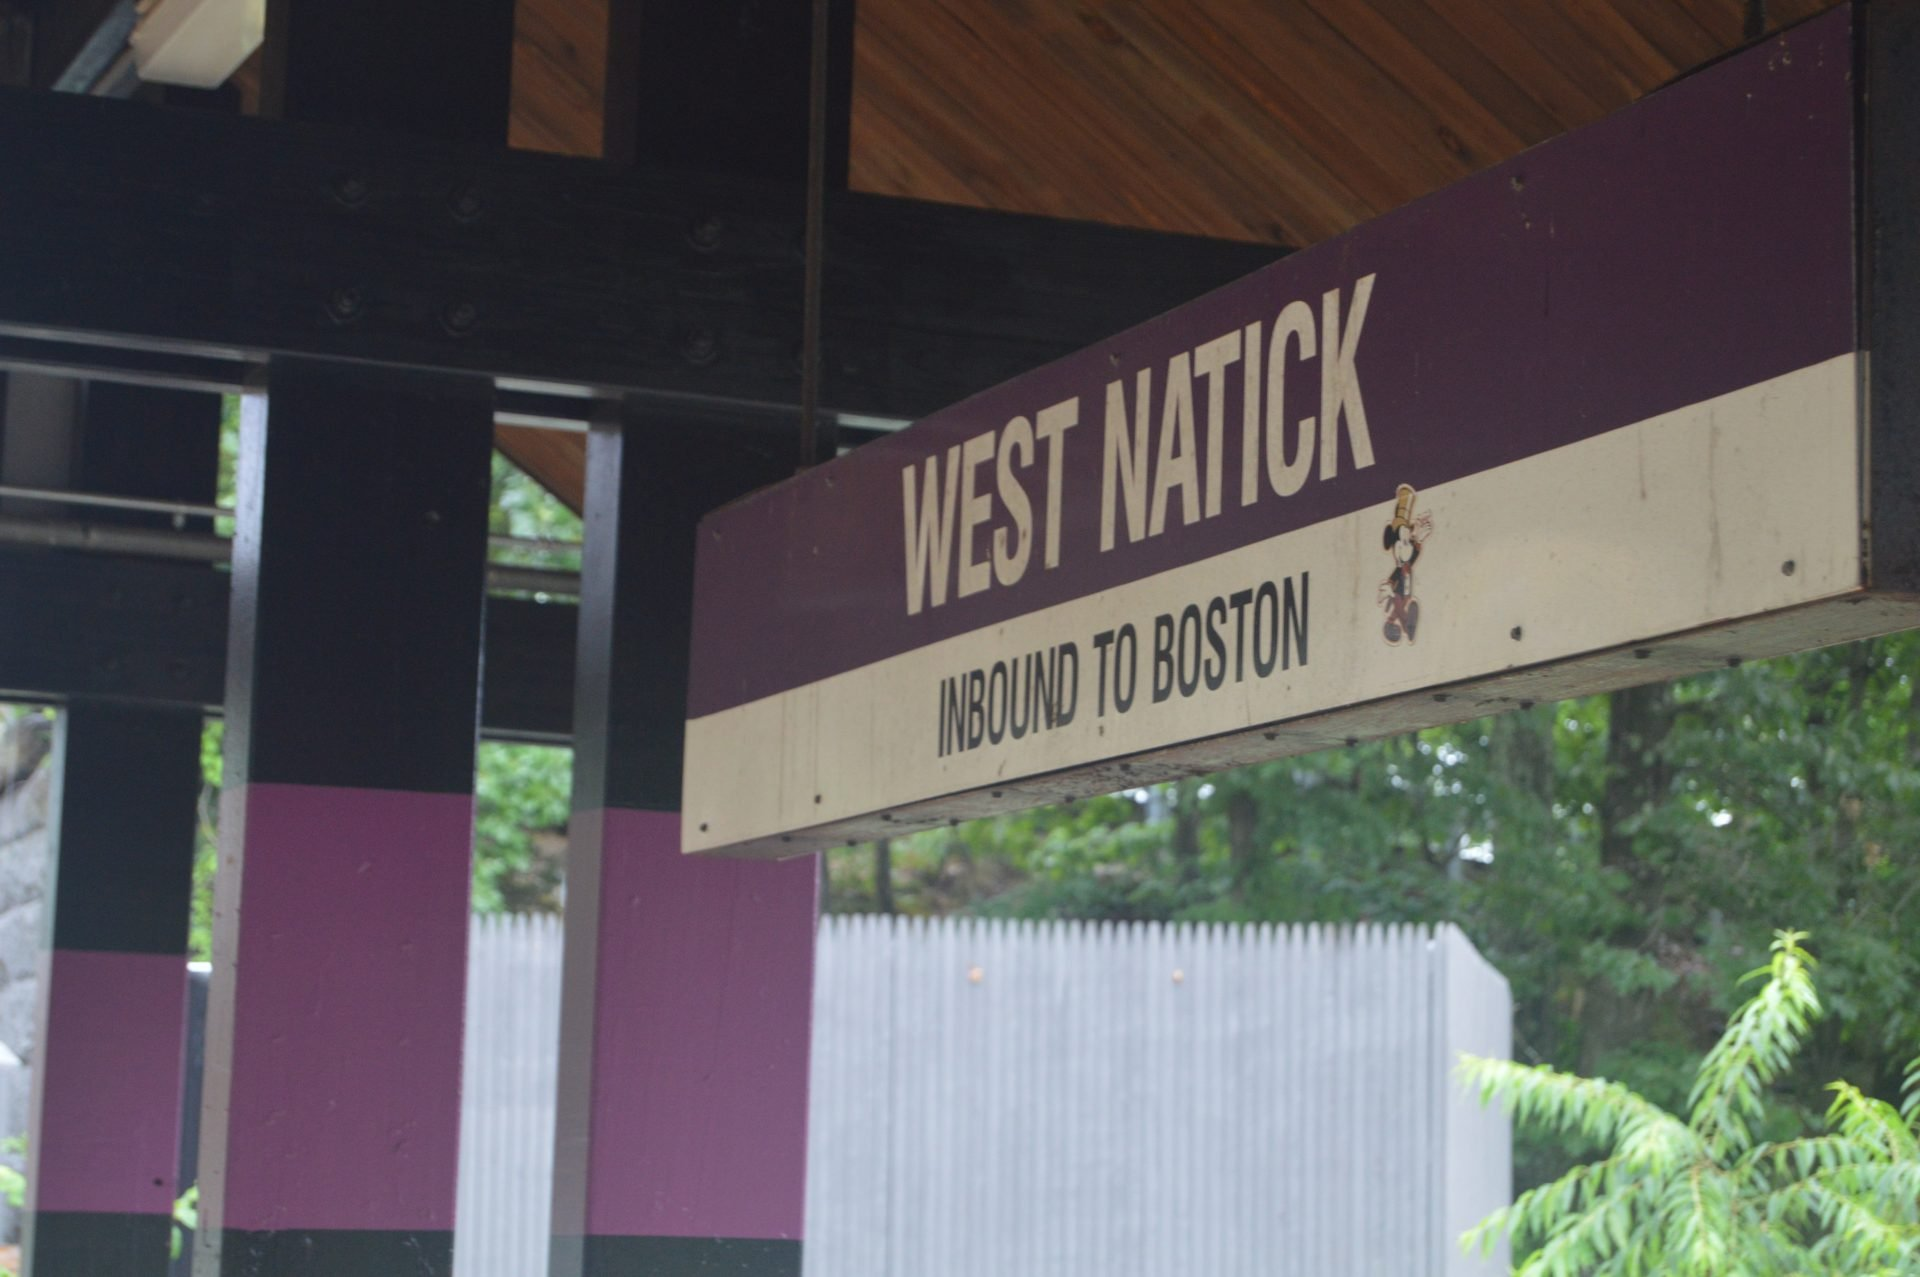 west natick commuter rail